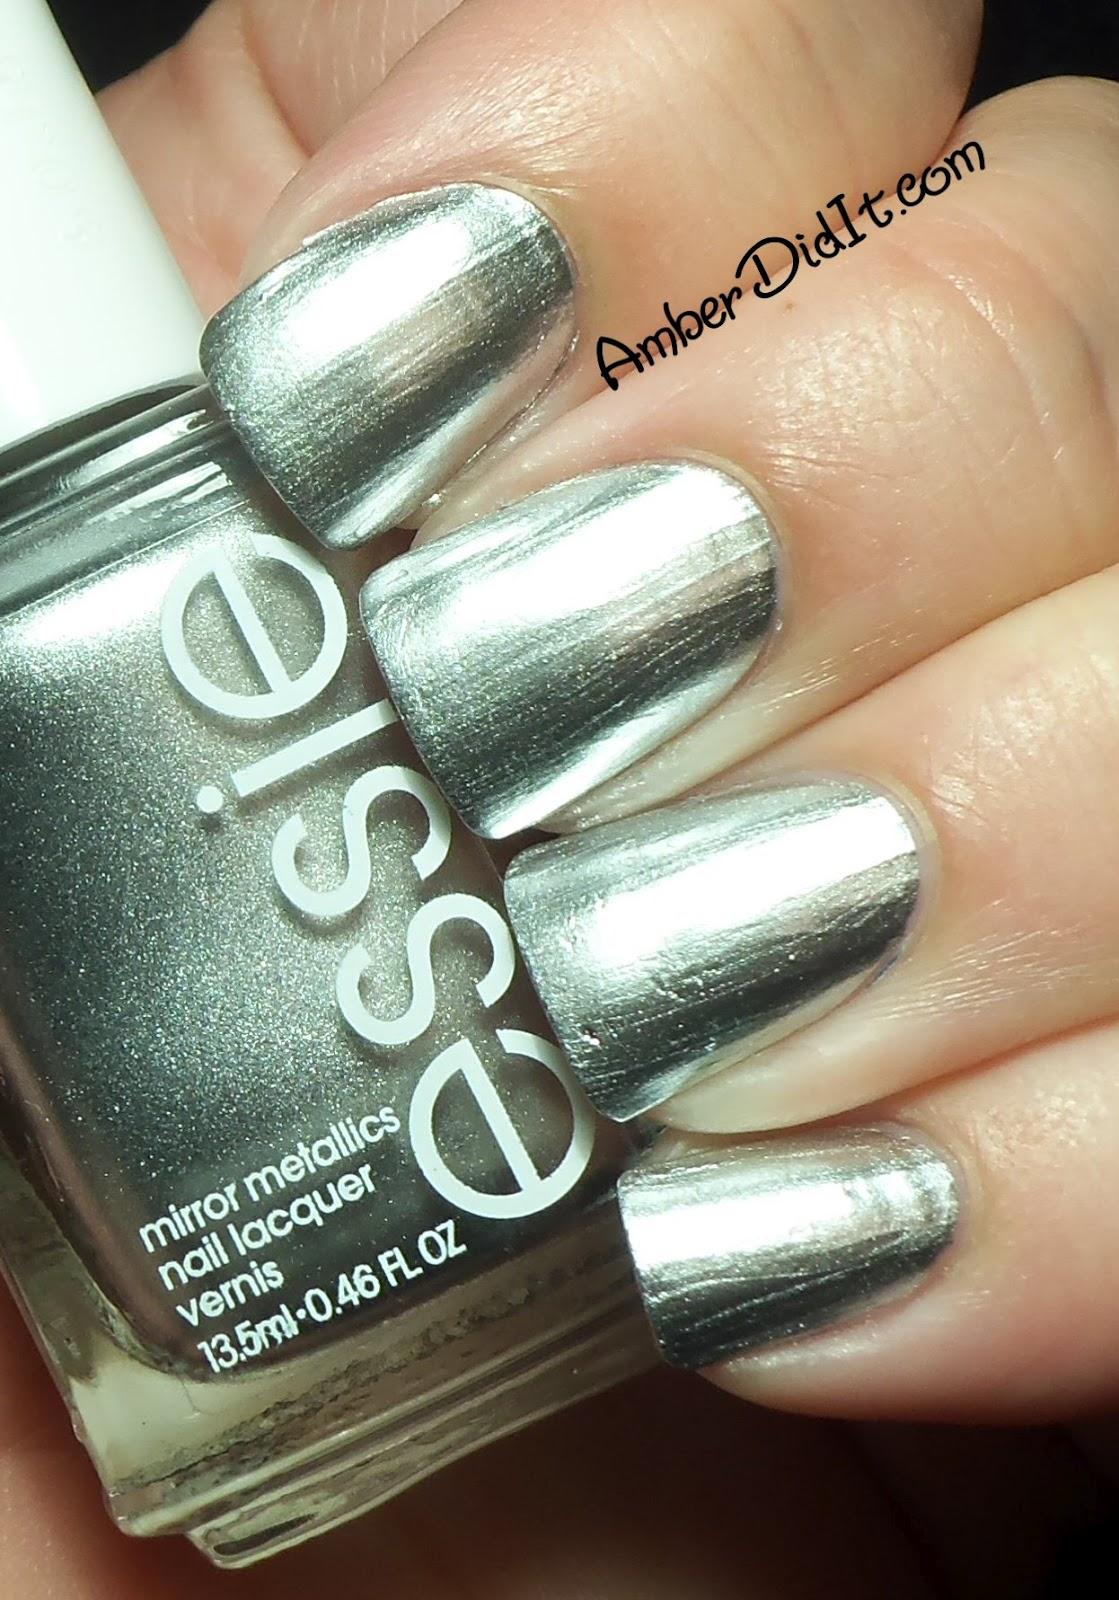 Essie Chrome Nail Polish Swatches | Hession Hairdressing